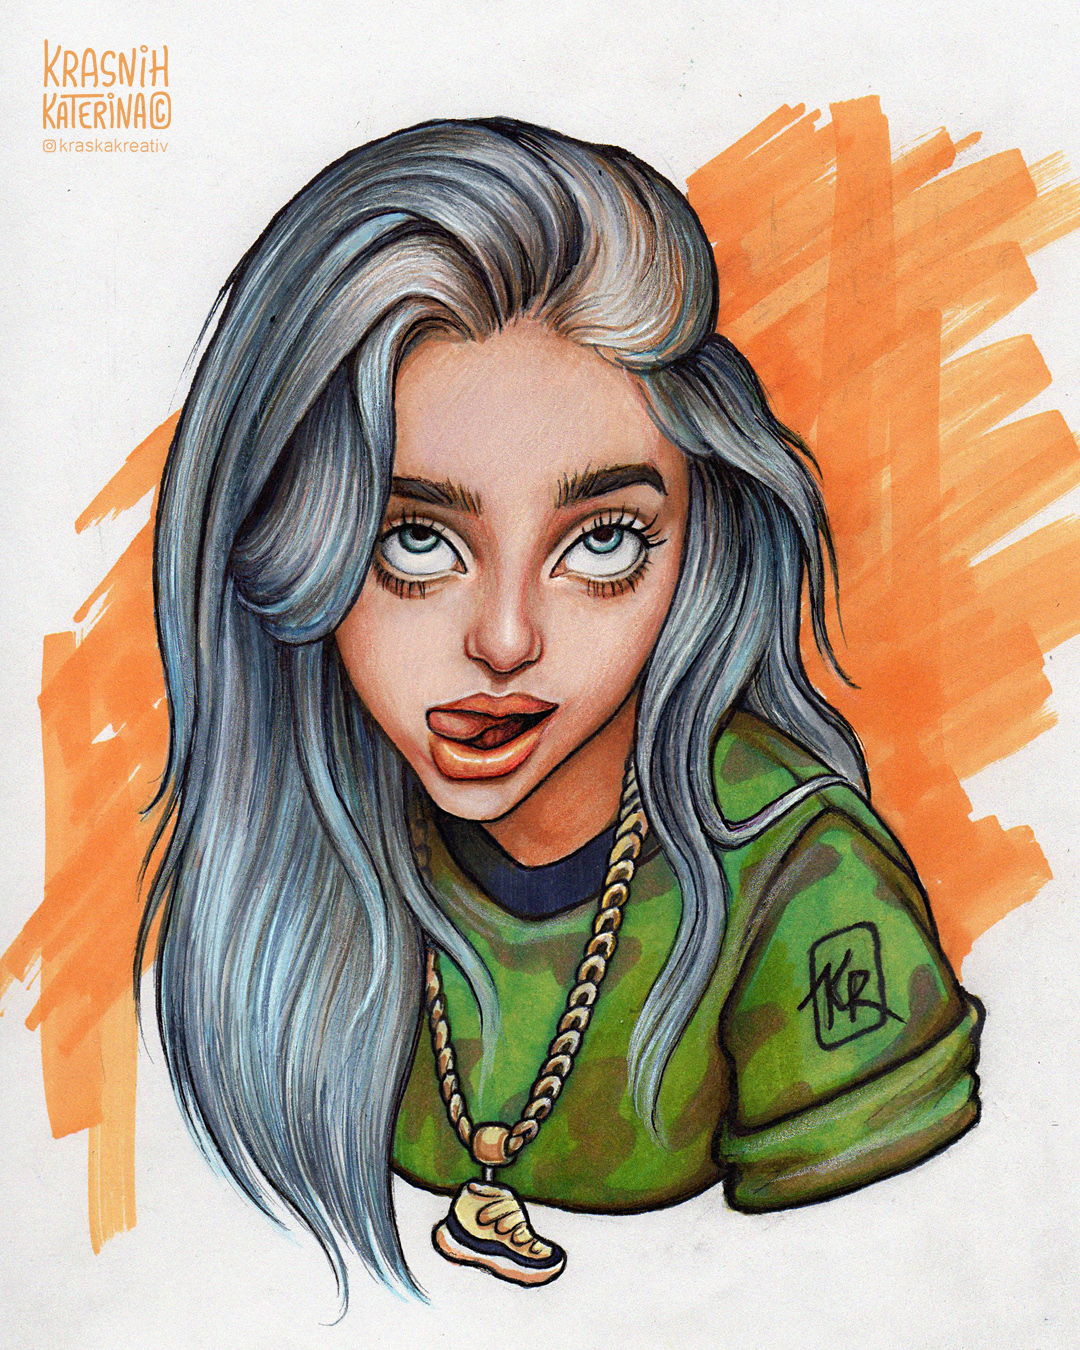 cartoon style portrait Billie Eilish fine art drawing illustration by Krasnih Katerina